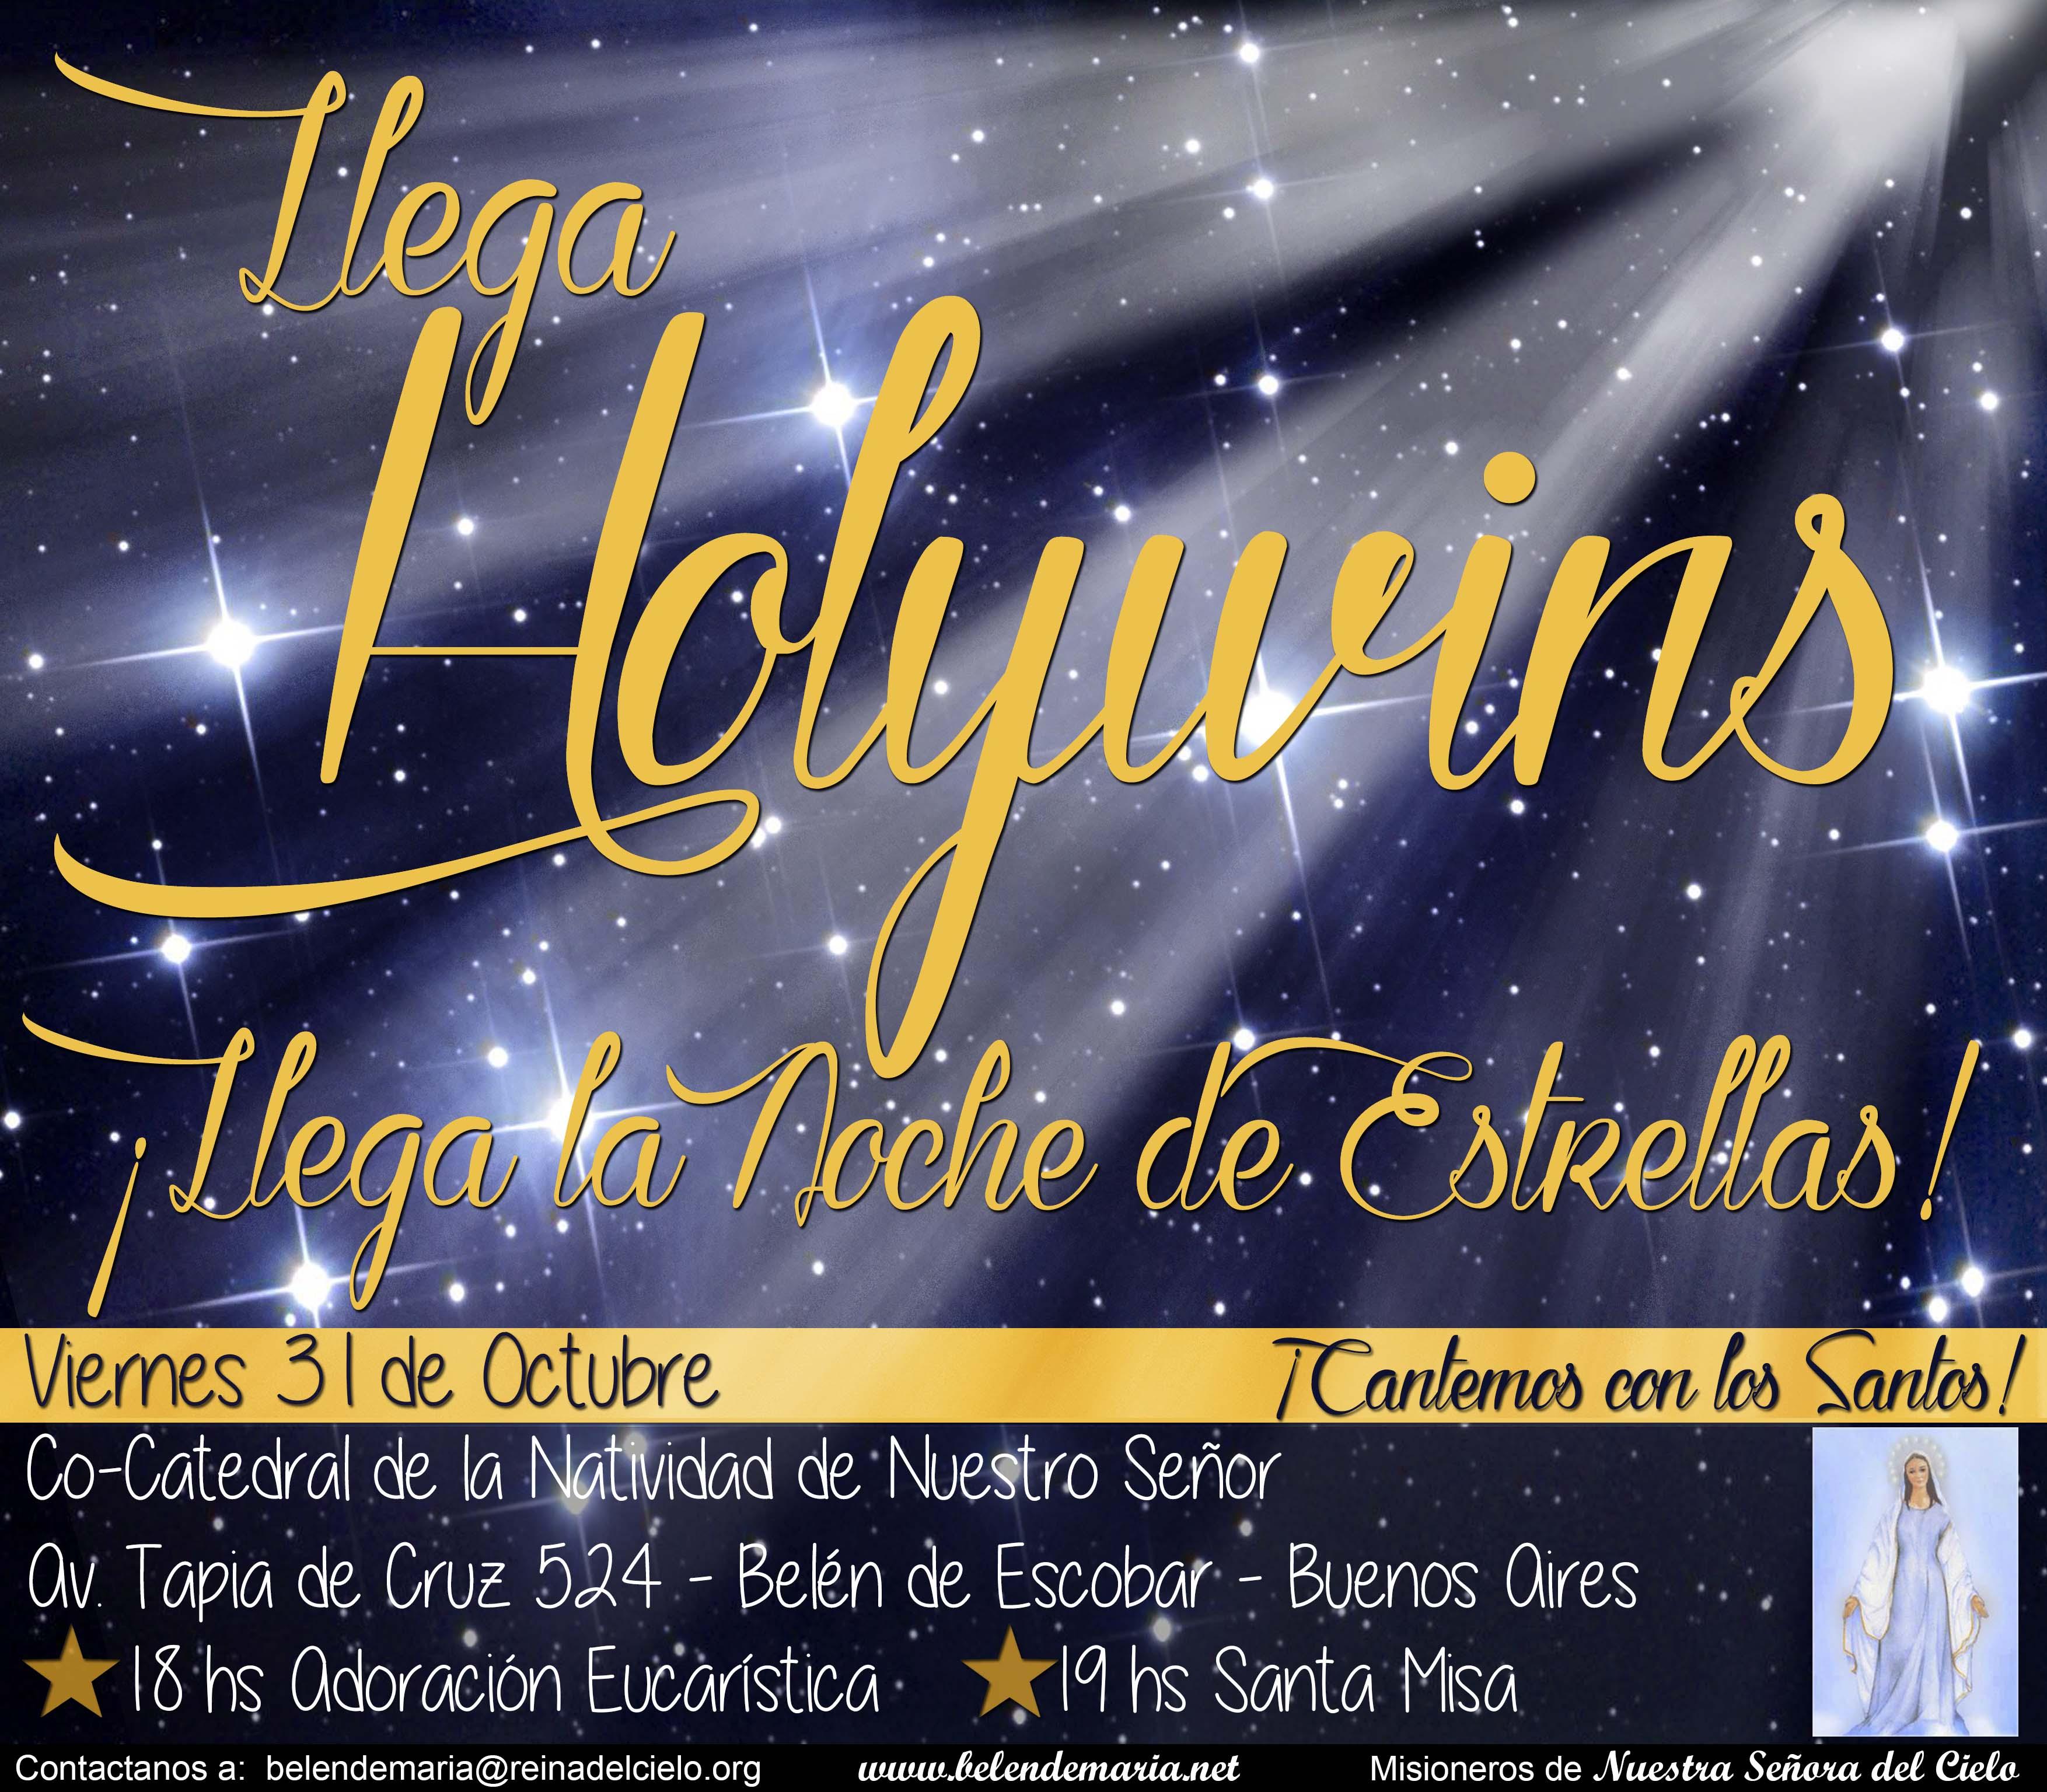 Invitacion Holywins 2014 OK